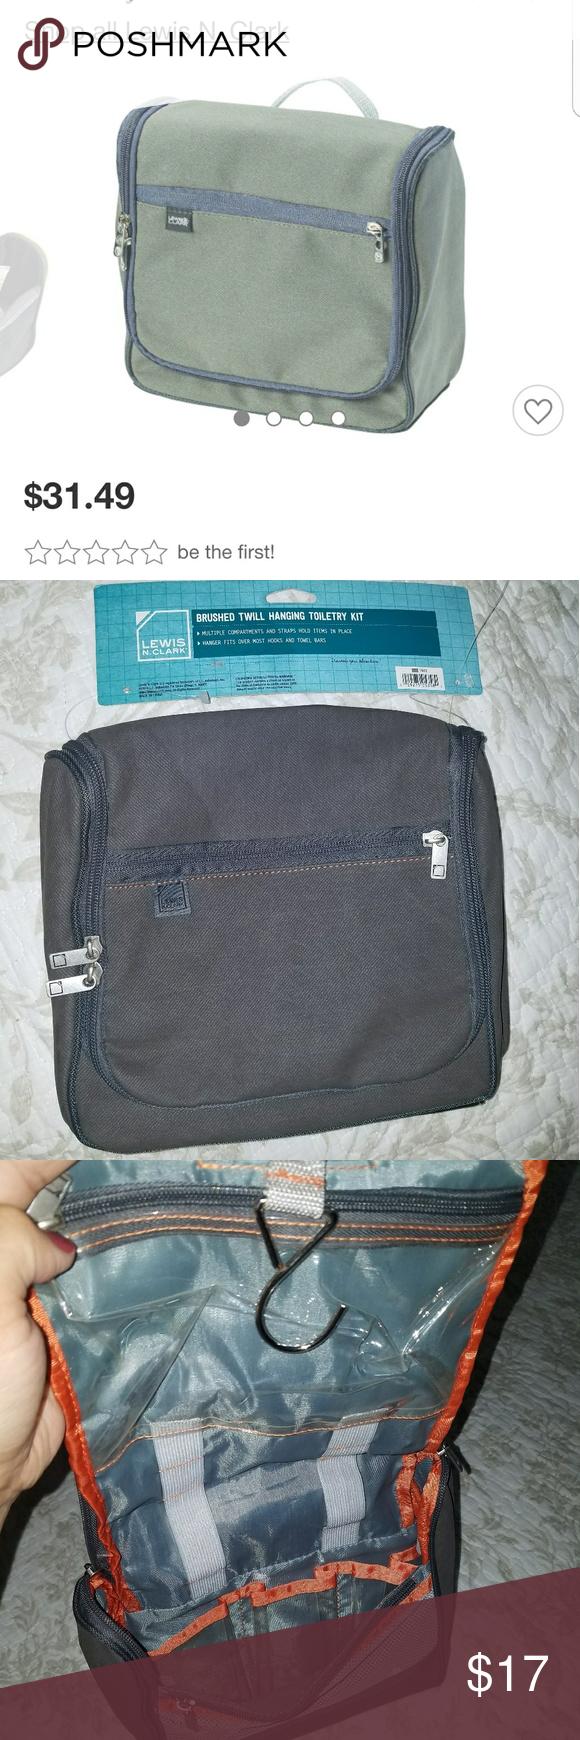 c410d768812 travel bag to hanging toiletry kit NWT en 2018   My Posh Closet   Pinterest    Travel Bag, Bags y Fashion tips